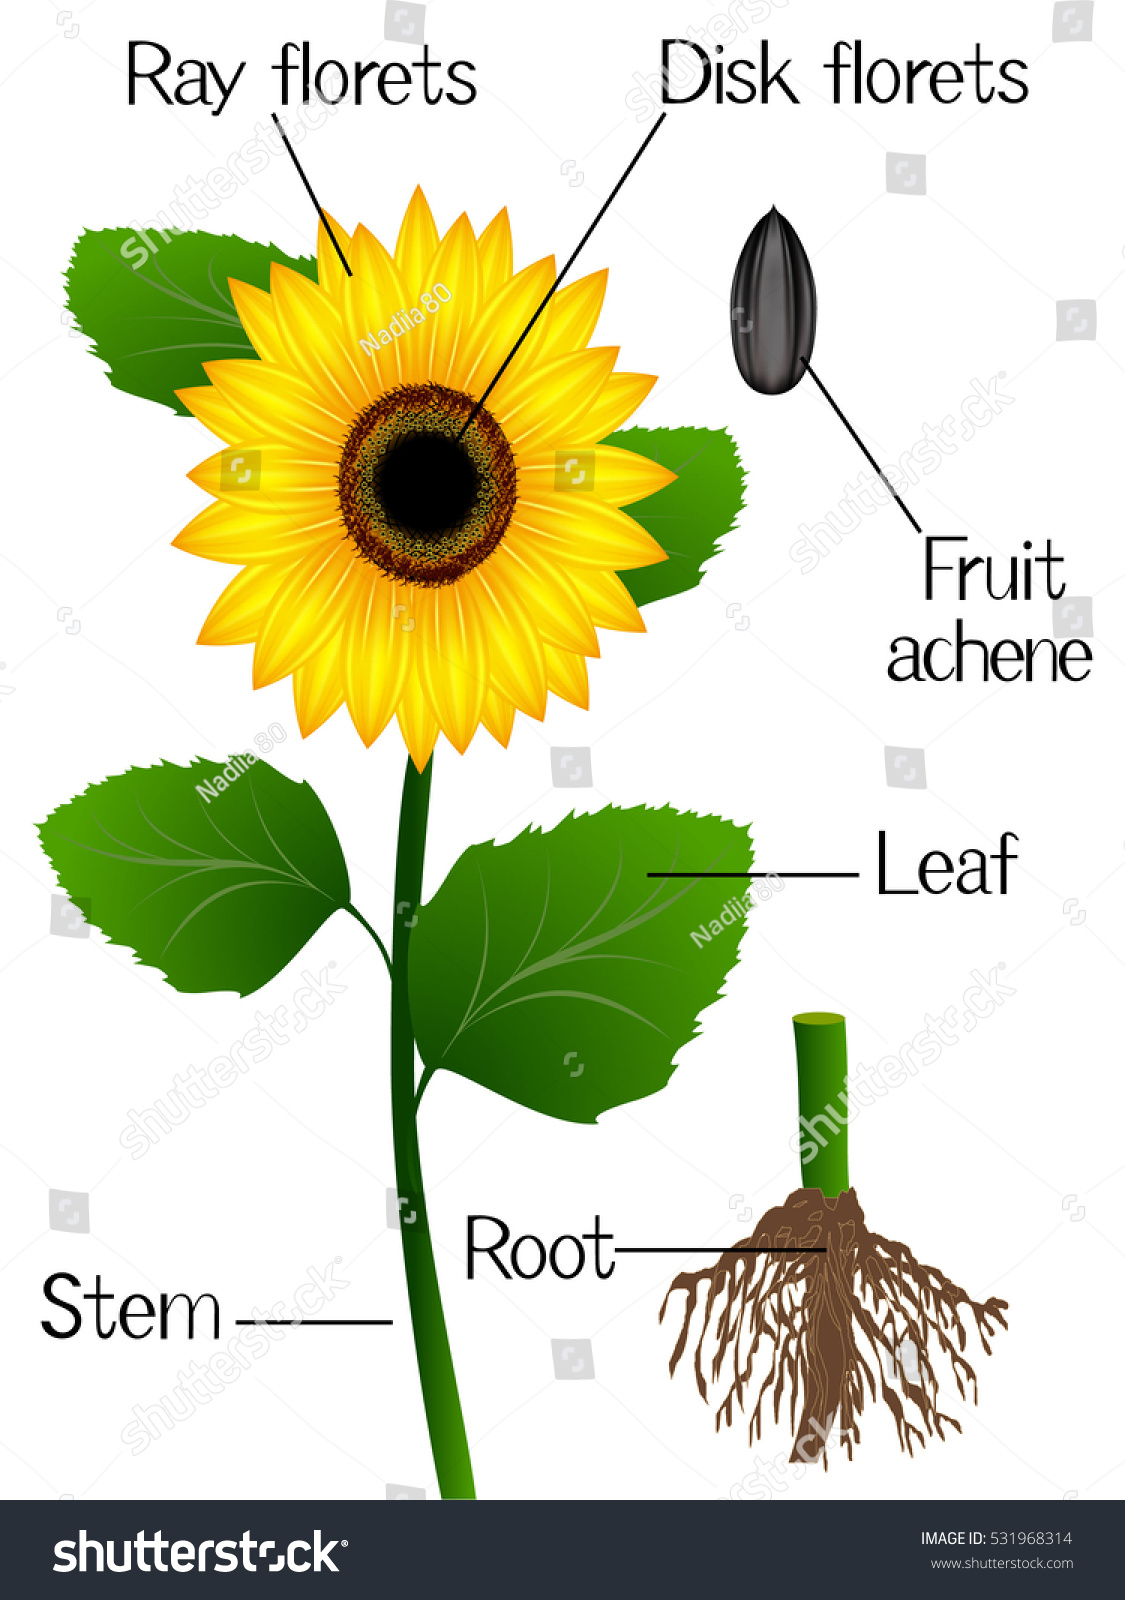 Sunflower Diagram : sunflower, diagram, Structure, Sunflower, Stock, Vector, (Royalty, Free), 531968314